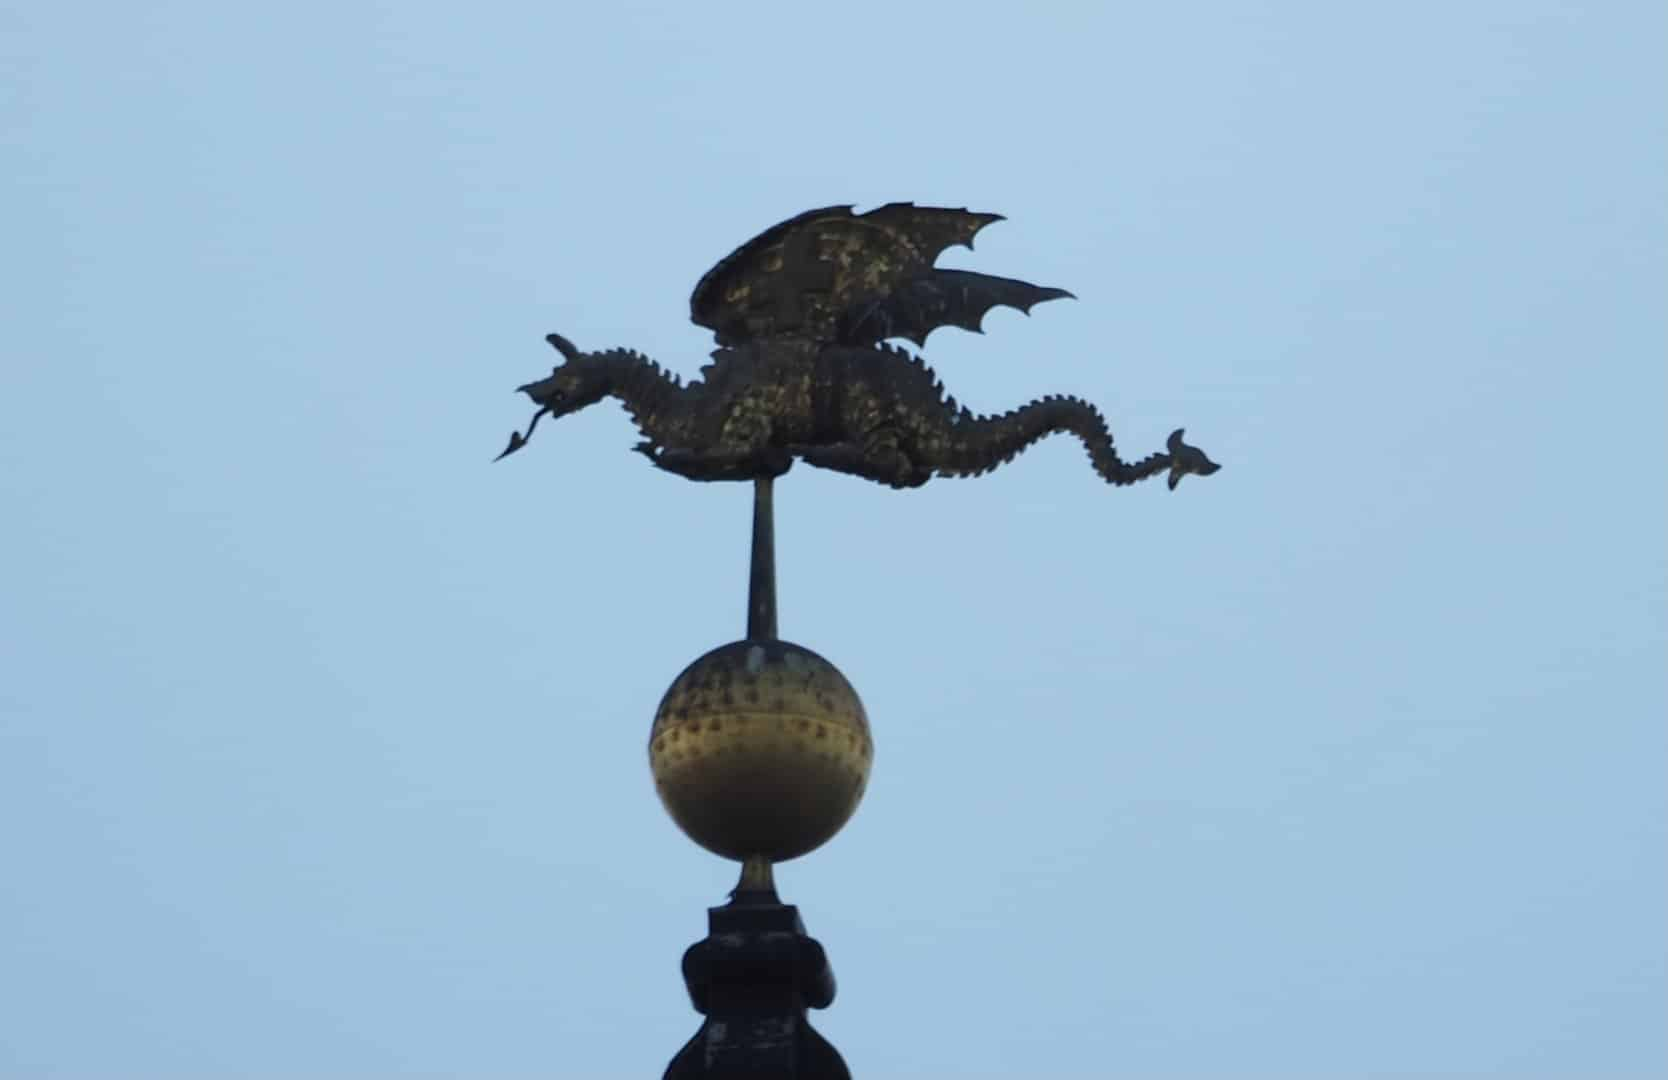 City of London Animals - Dragons